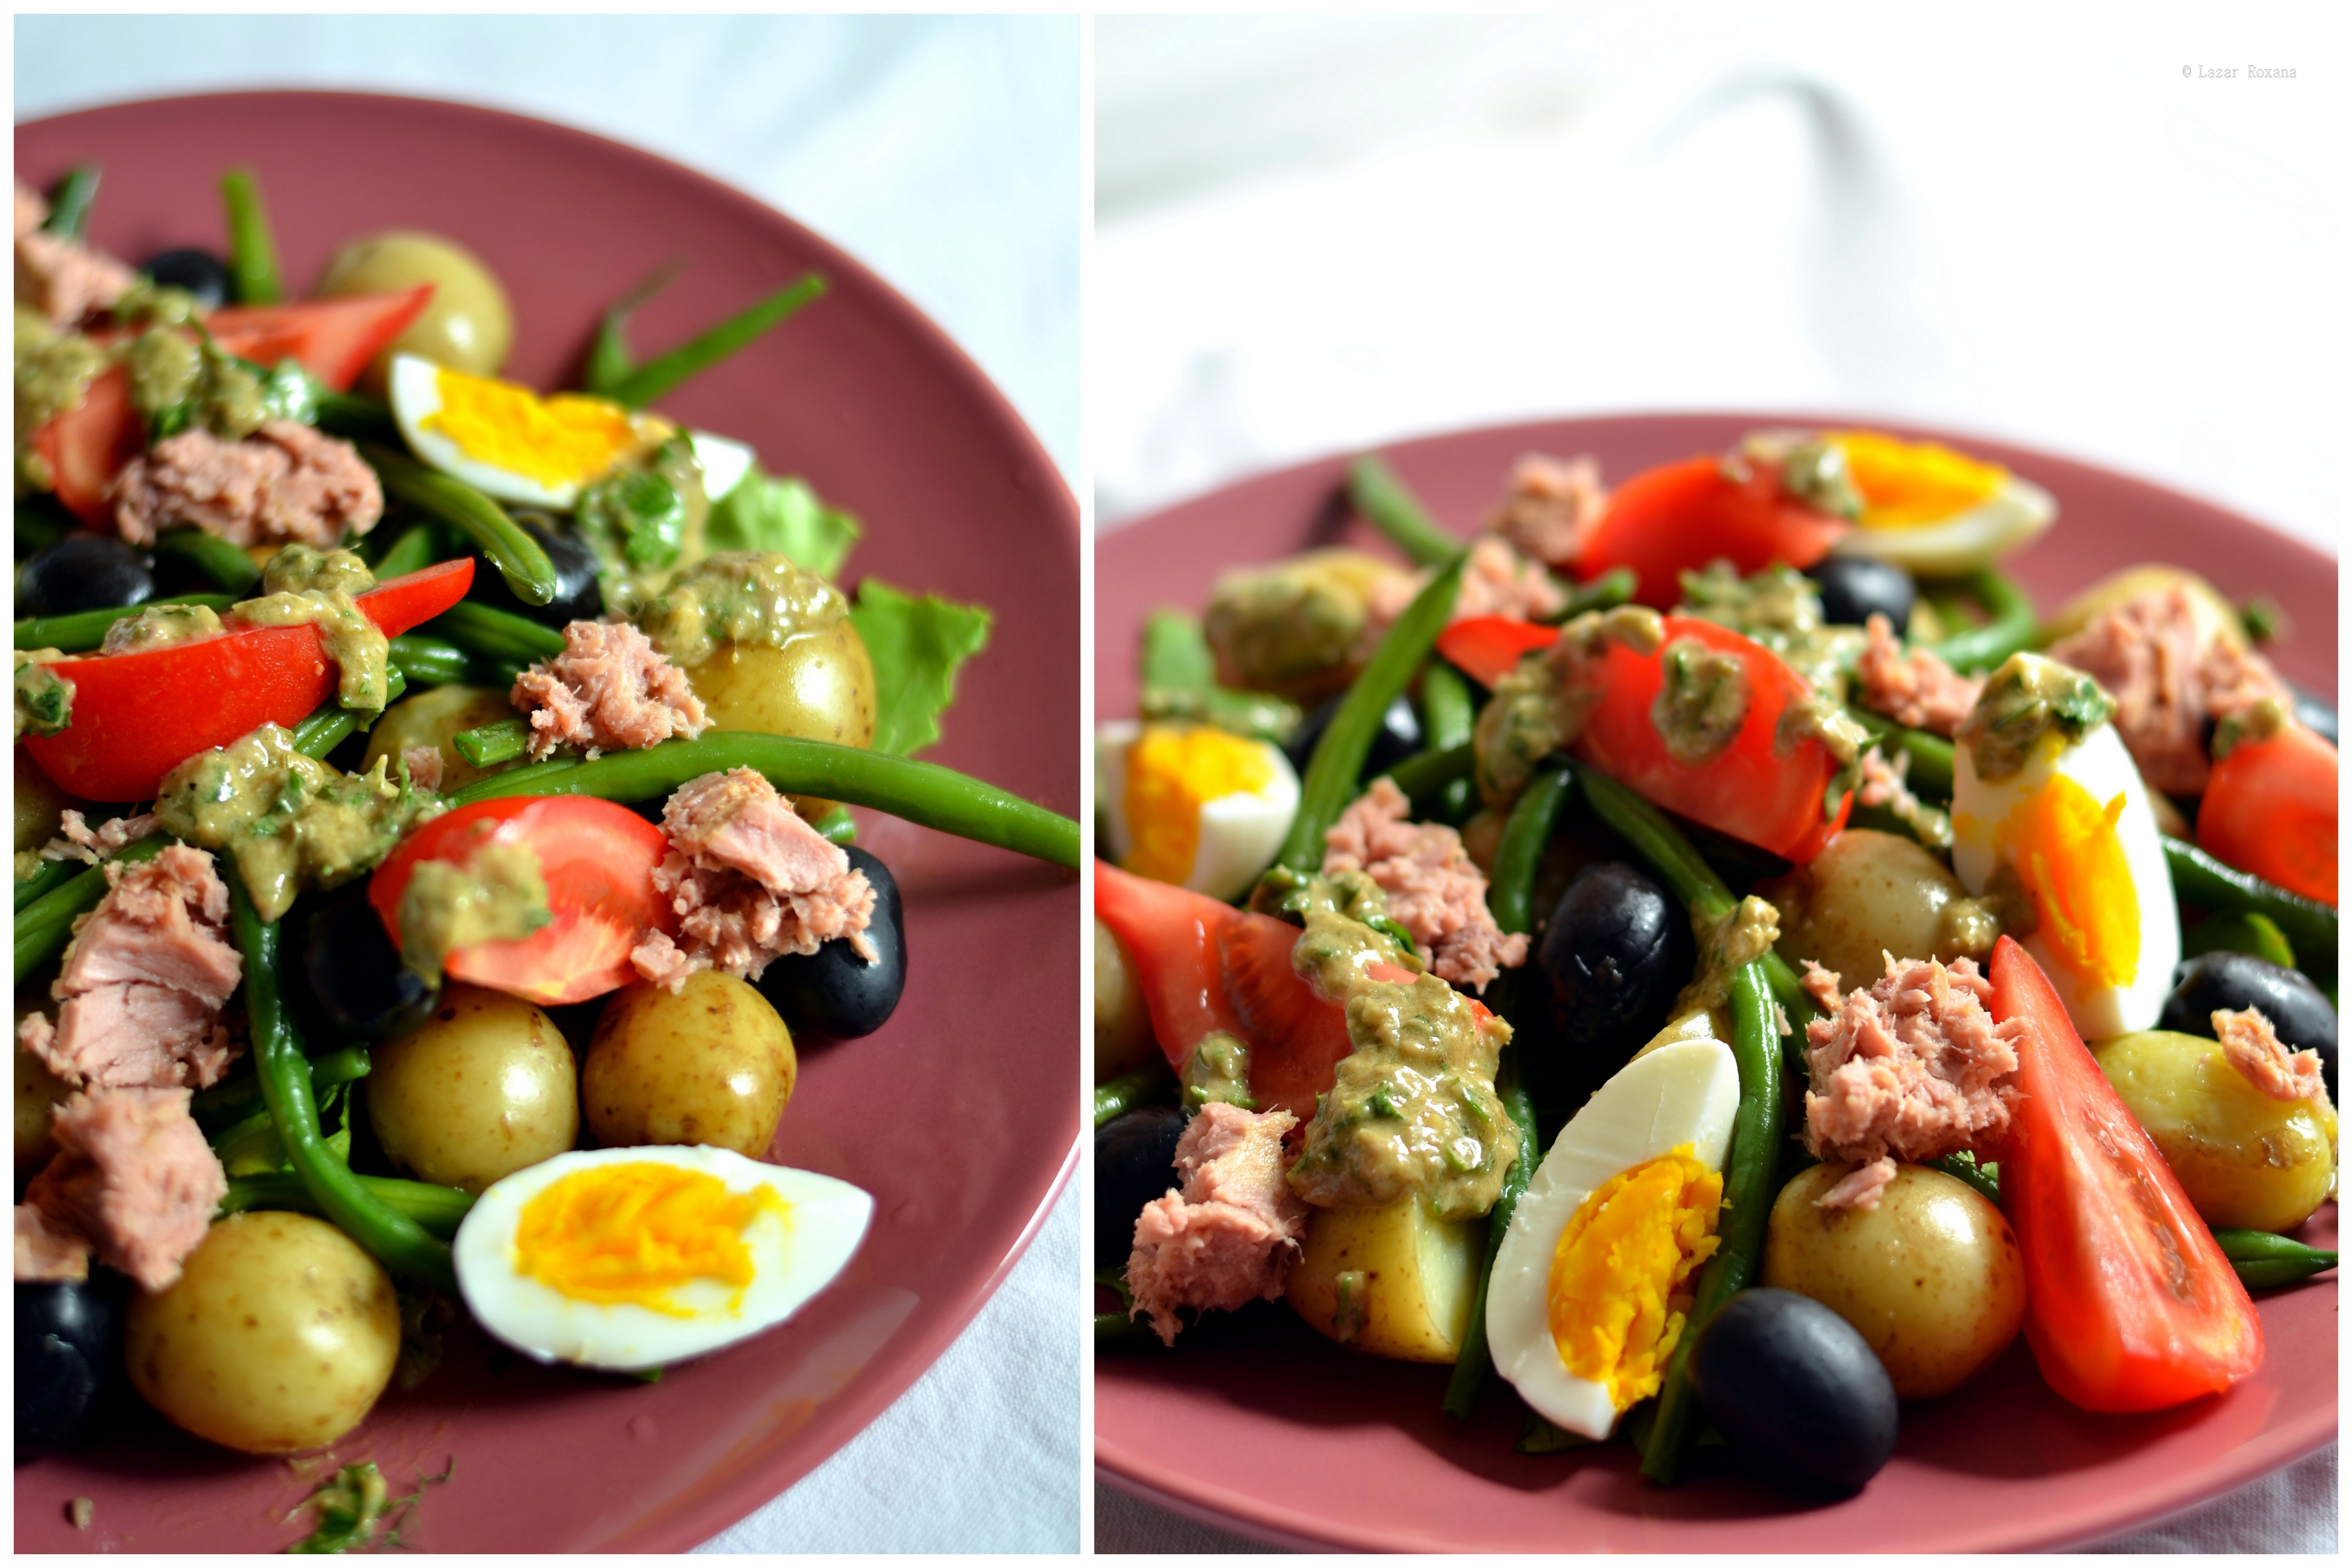 Salata nicoise cu ton a lui Gordon Ramsay